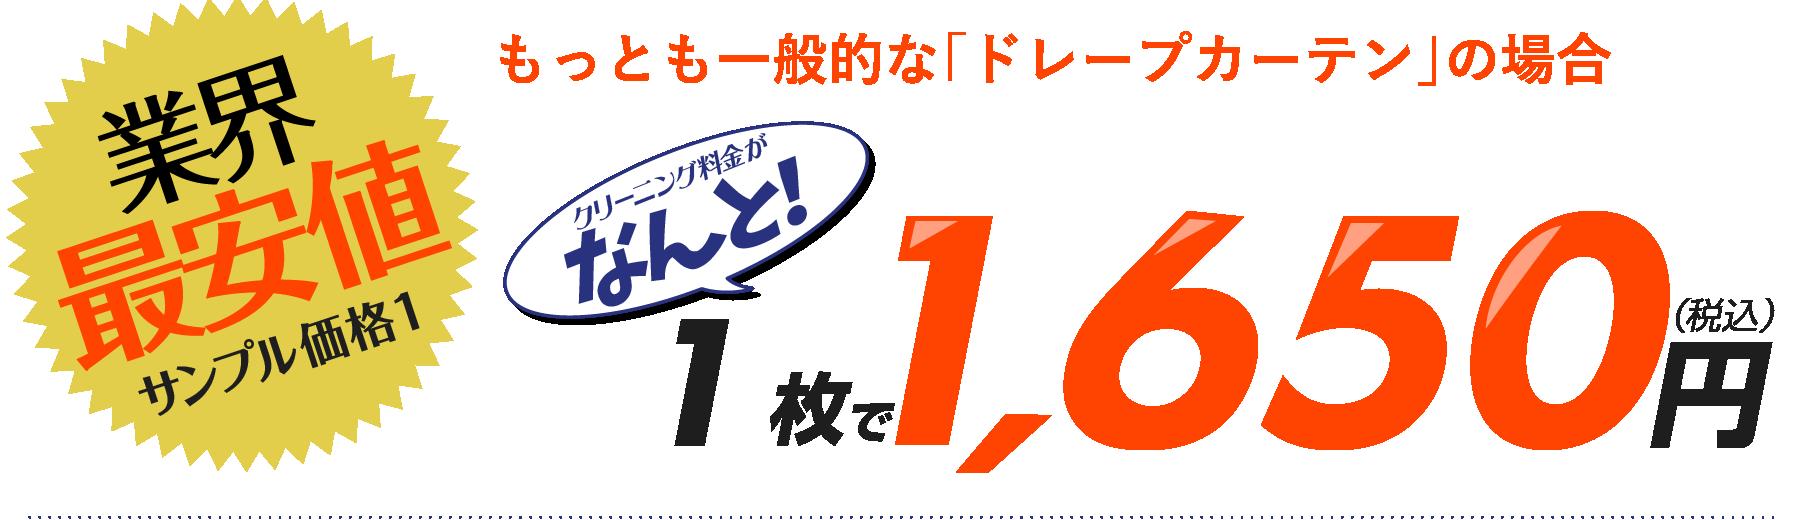 box3-image2